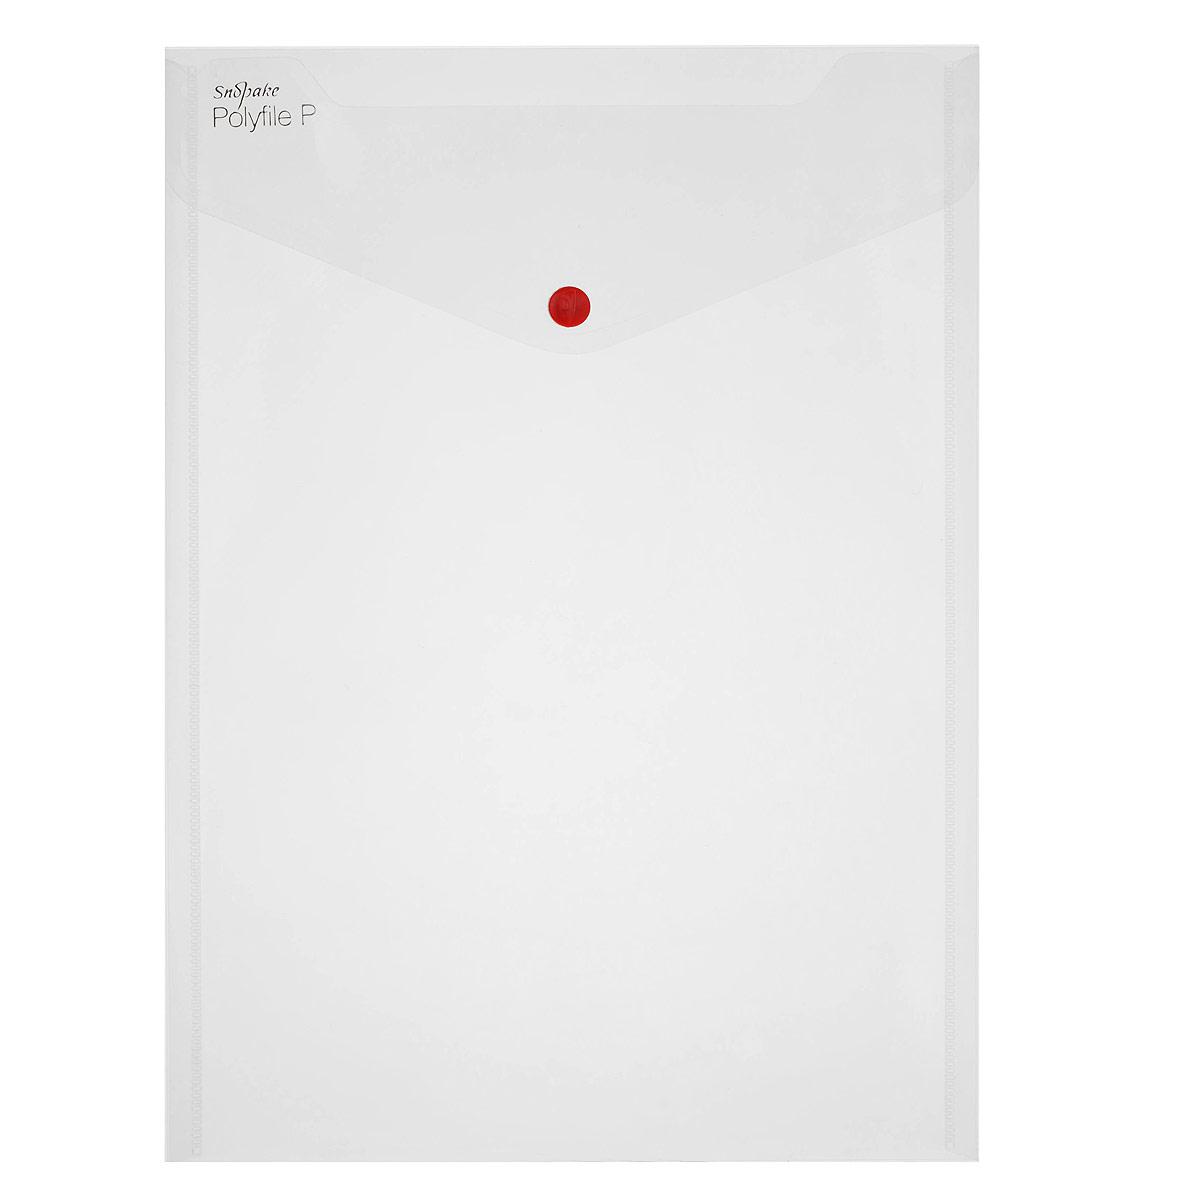 Папка-конверт на кнопке Snopake Polyfile P, вертикальная, цвет: прозрачный. Формат А4K13263